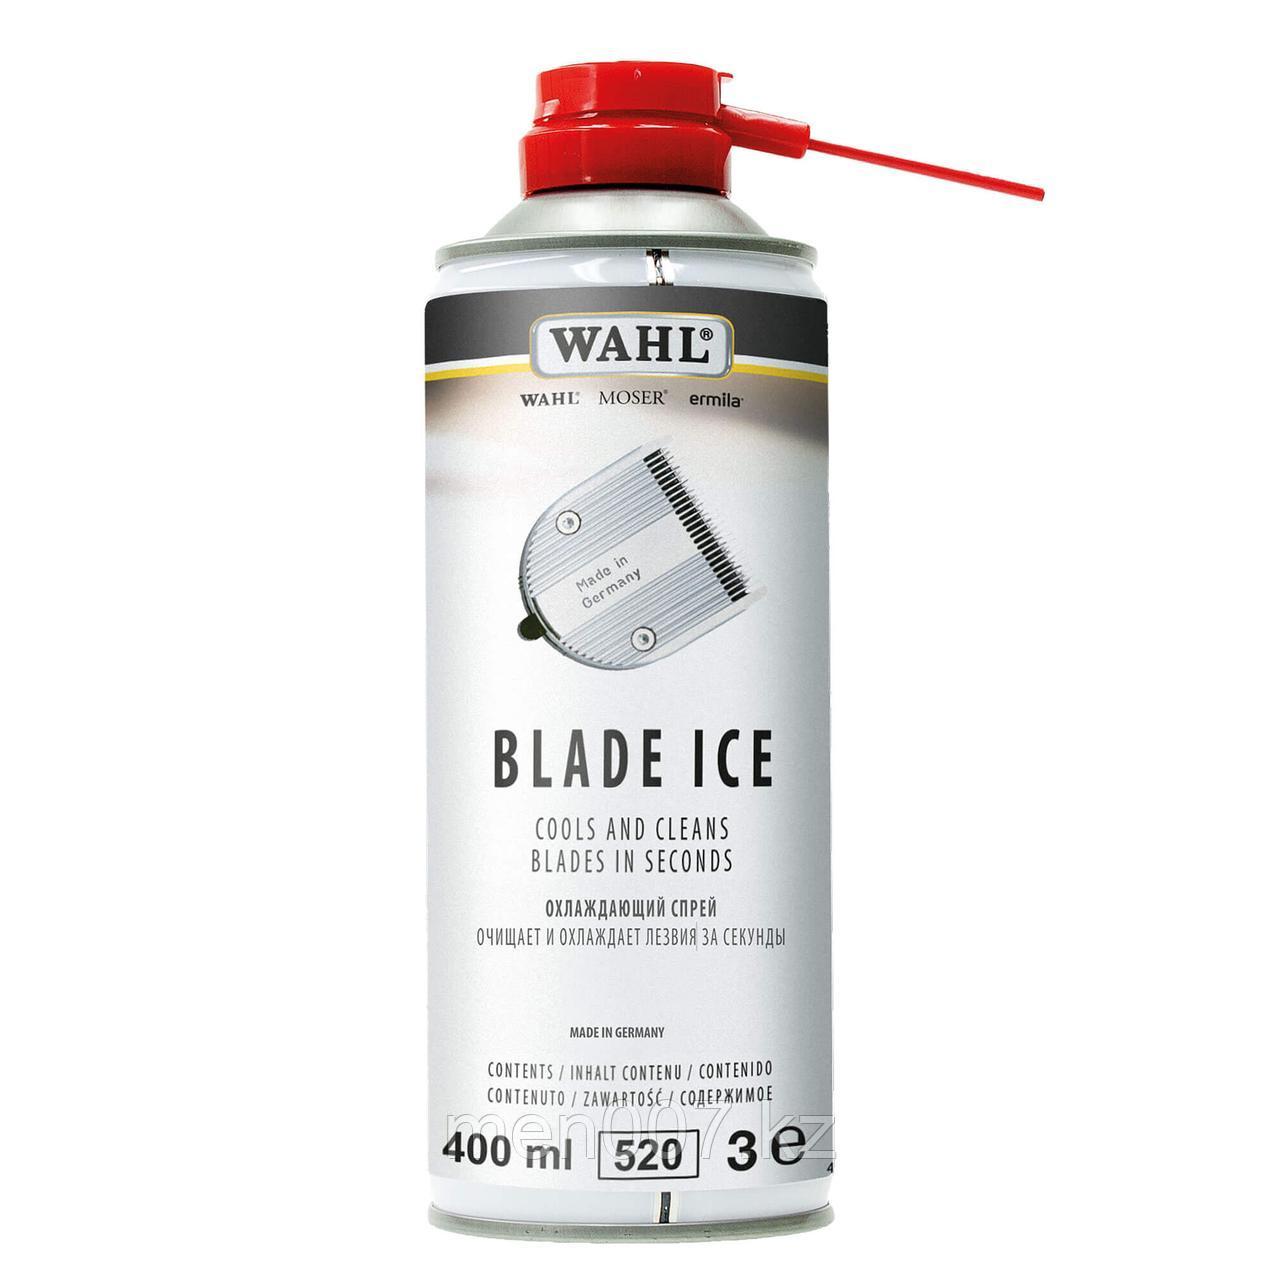 Wahl Blade Ice Спрей охлаждающий для ухода за ножами машинок, 400 мл